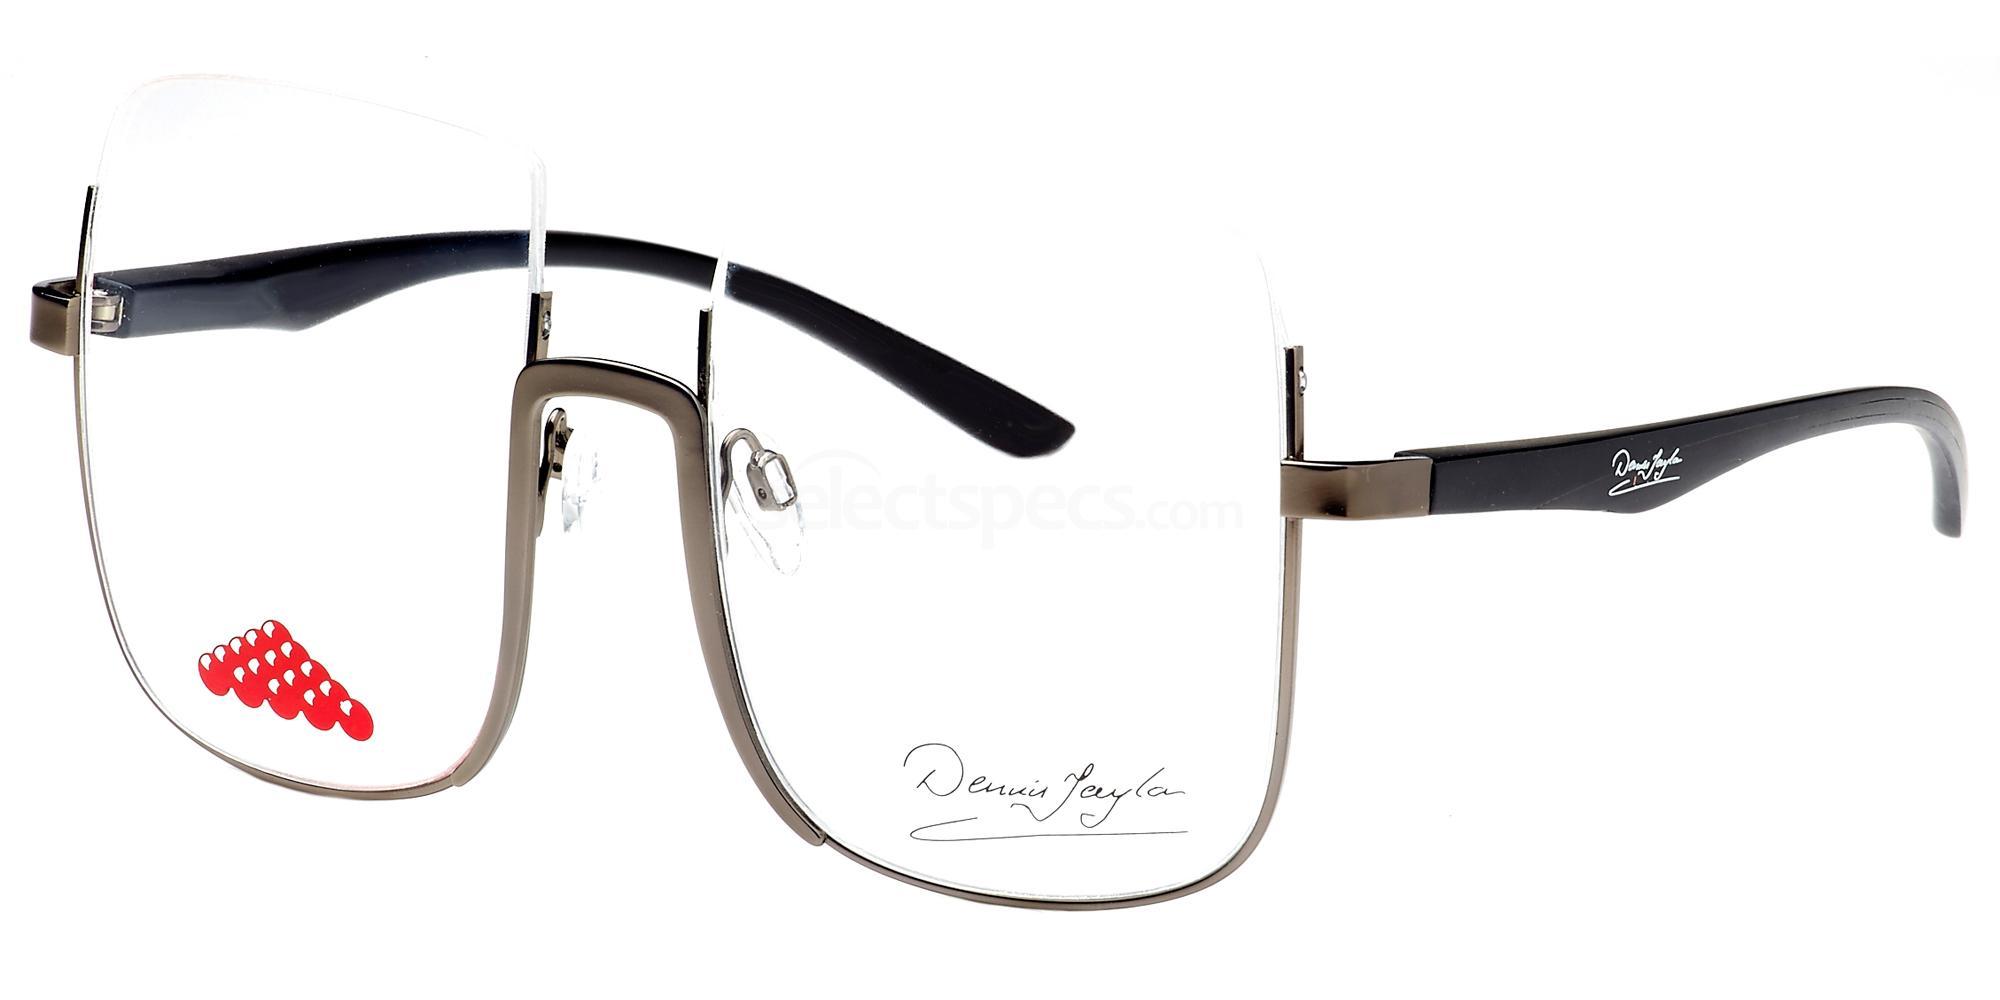 C1 DTSN01 - Pro-Snooker Glasses Glasses, Dennis Taylor